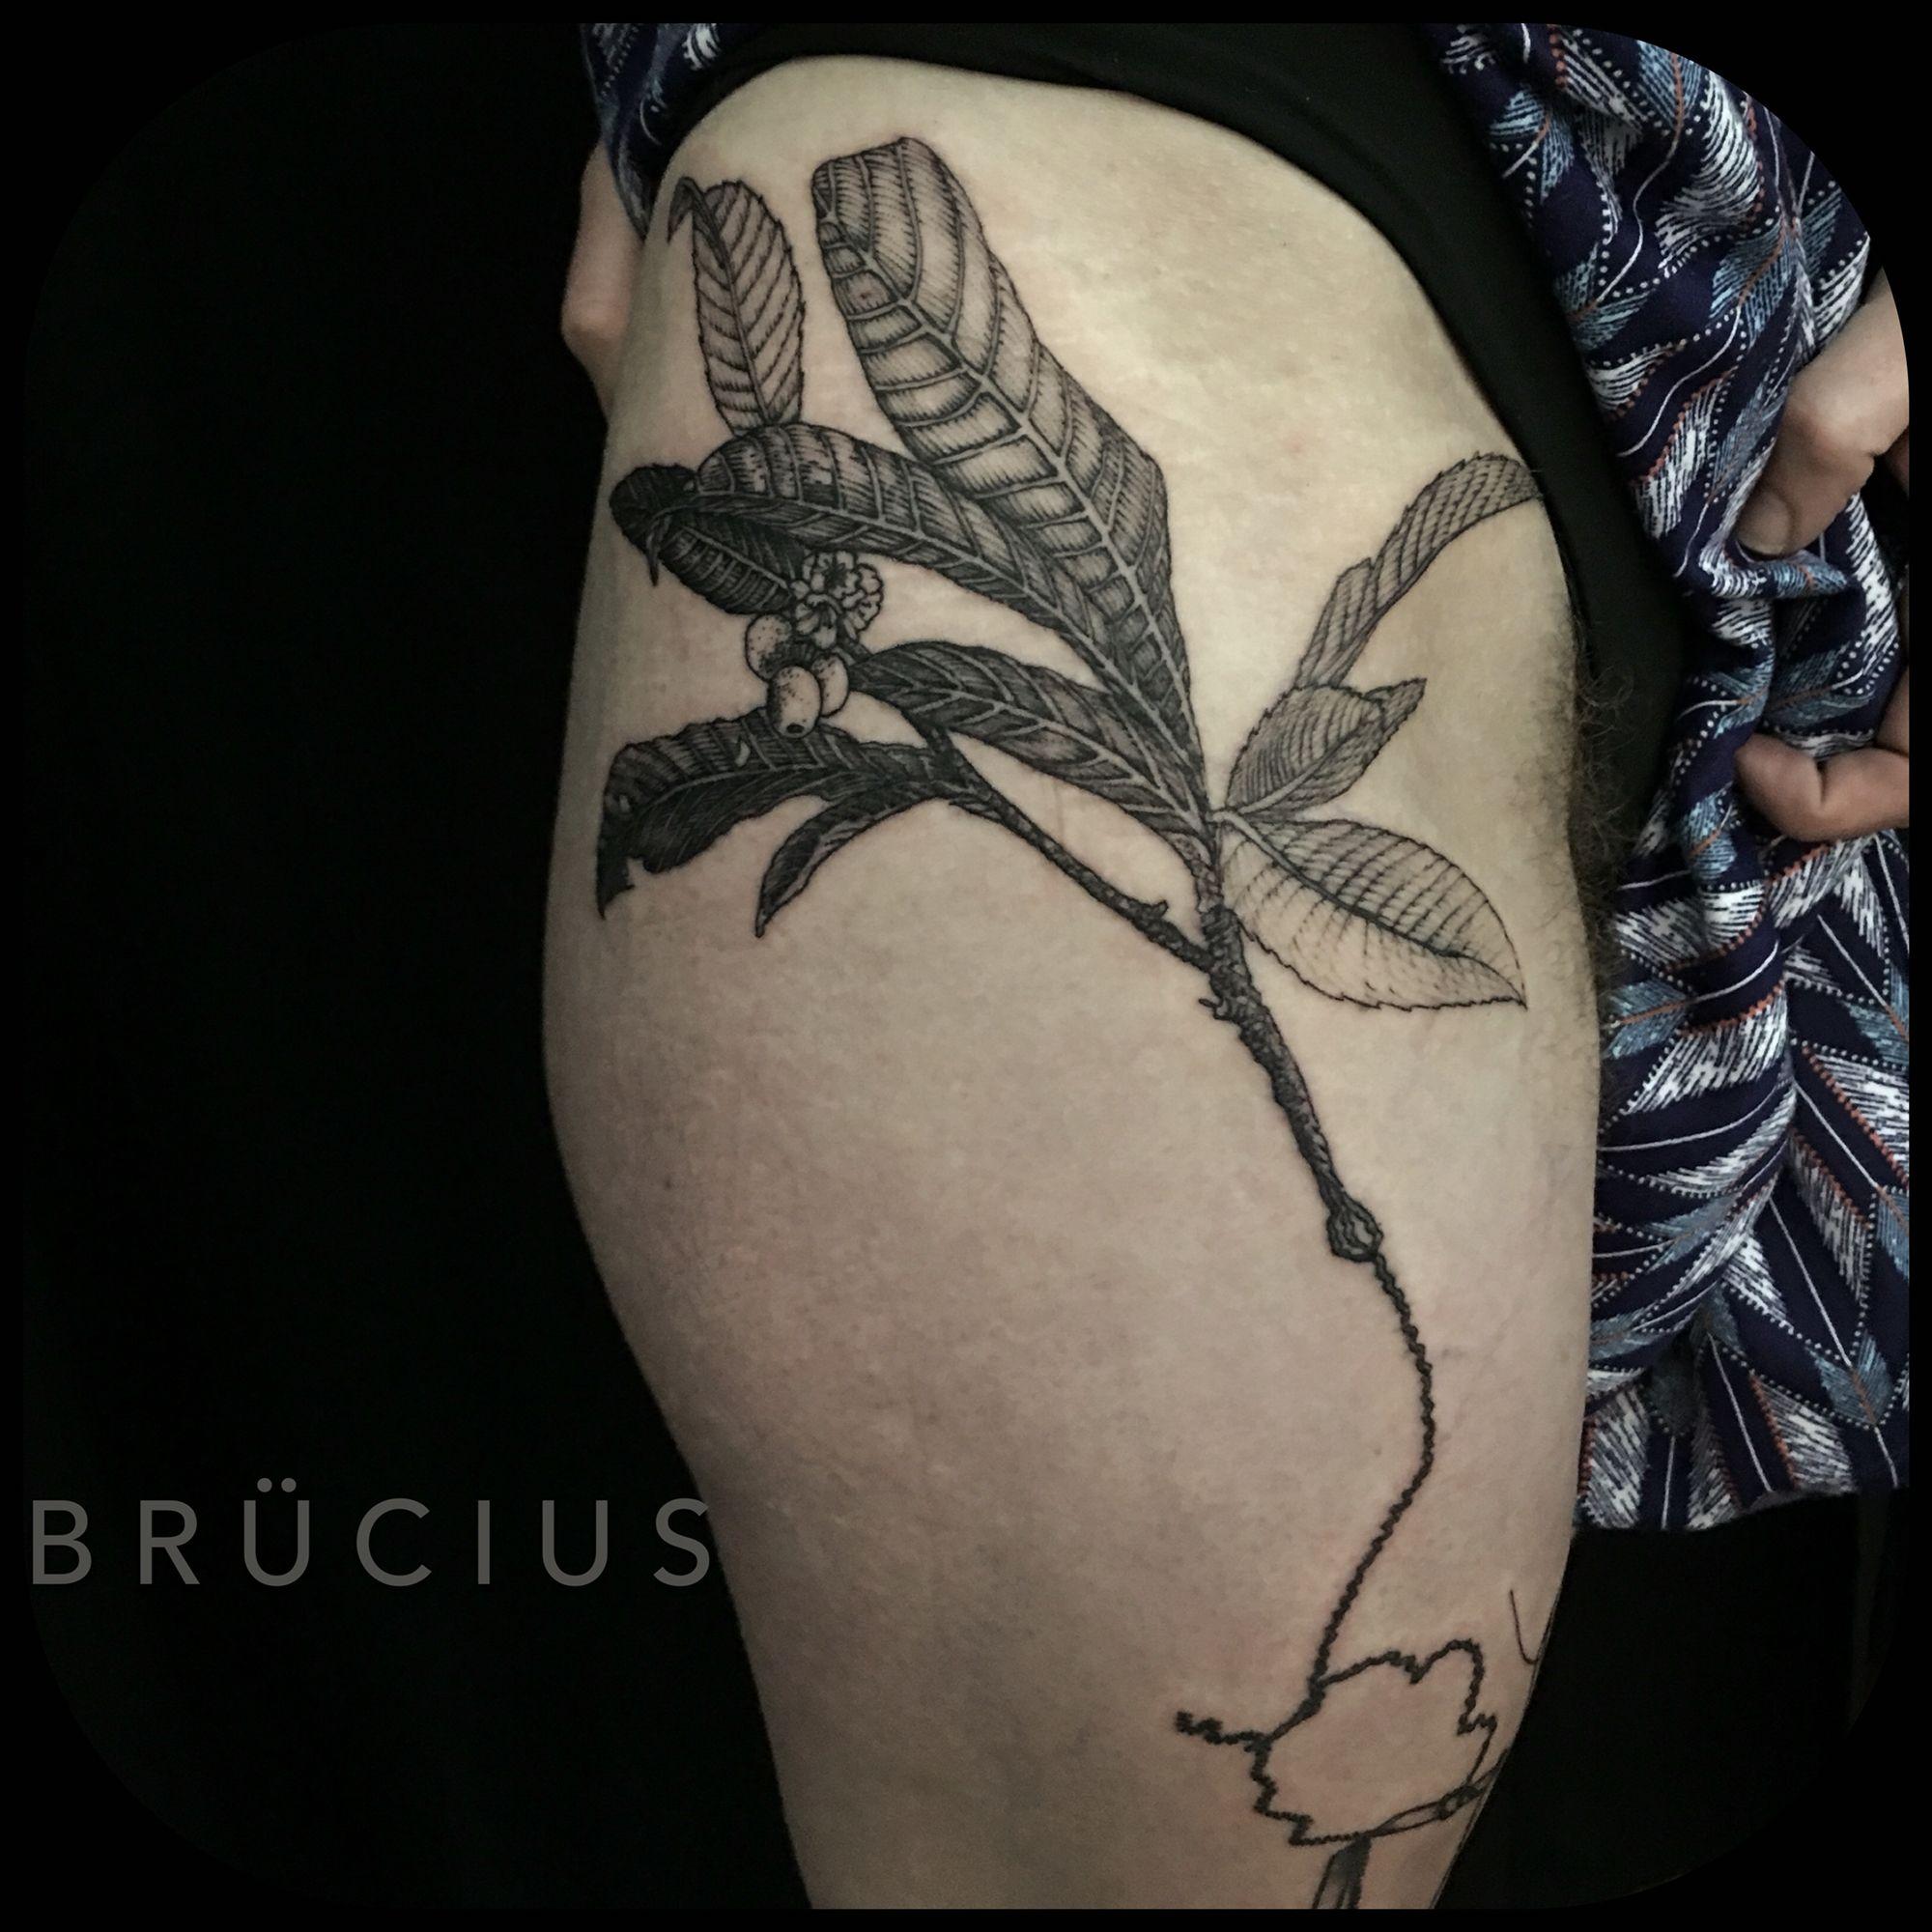 #BRUCIUS #TATTOO #SanFrancisco #bayareatattoo  #sciencetattoo #engravingtattoo #etchingtattoo #sculptoroflines #dotwork #blackworkartist #blackwork #ink #penandink #strings #loquat